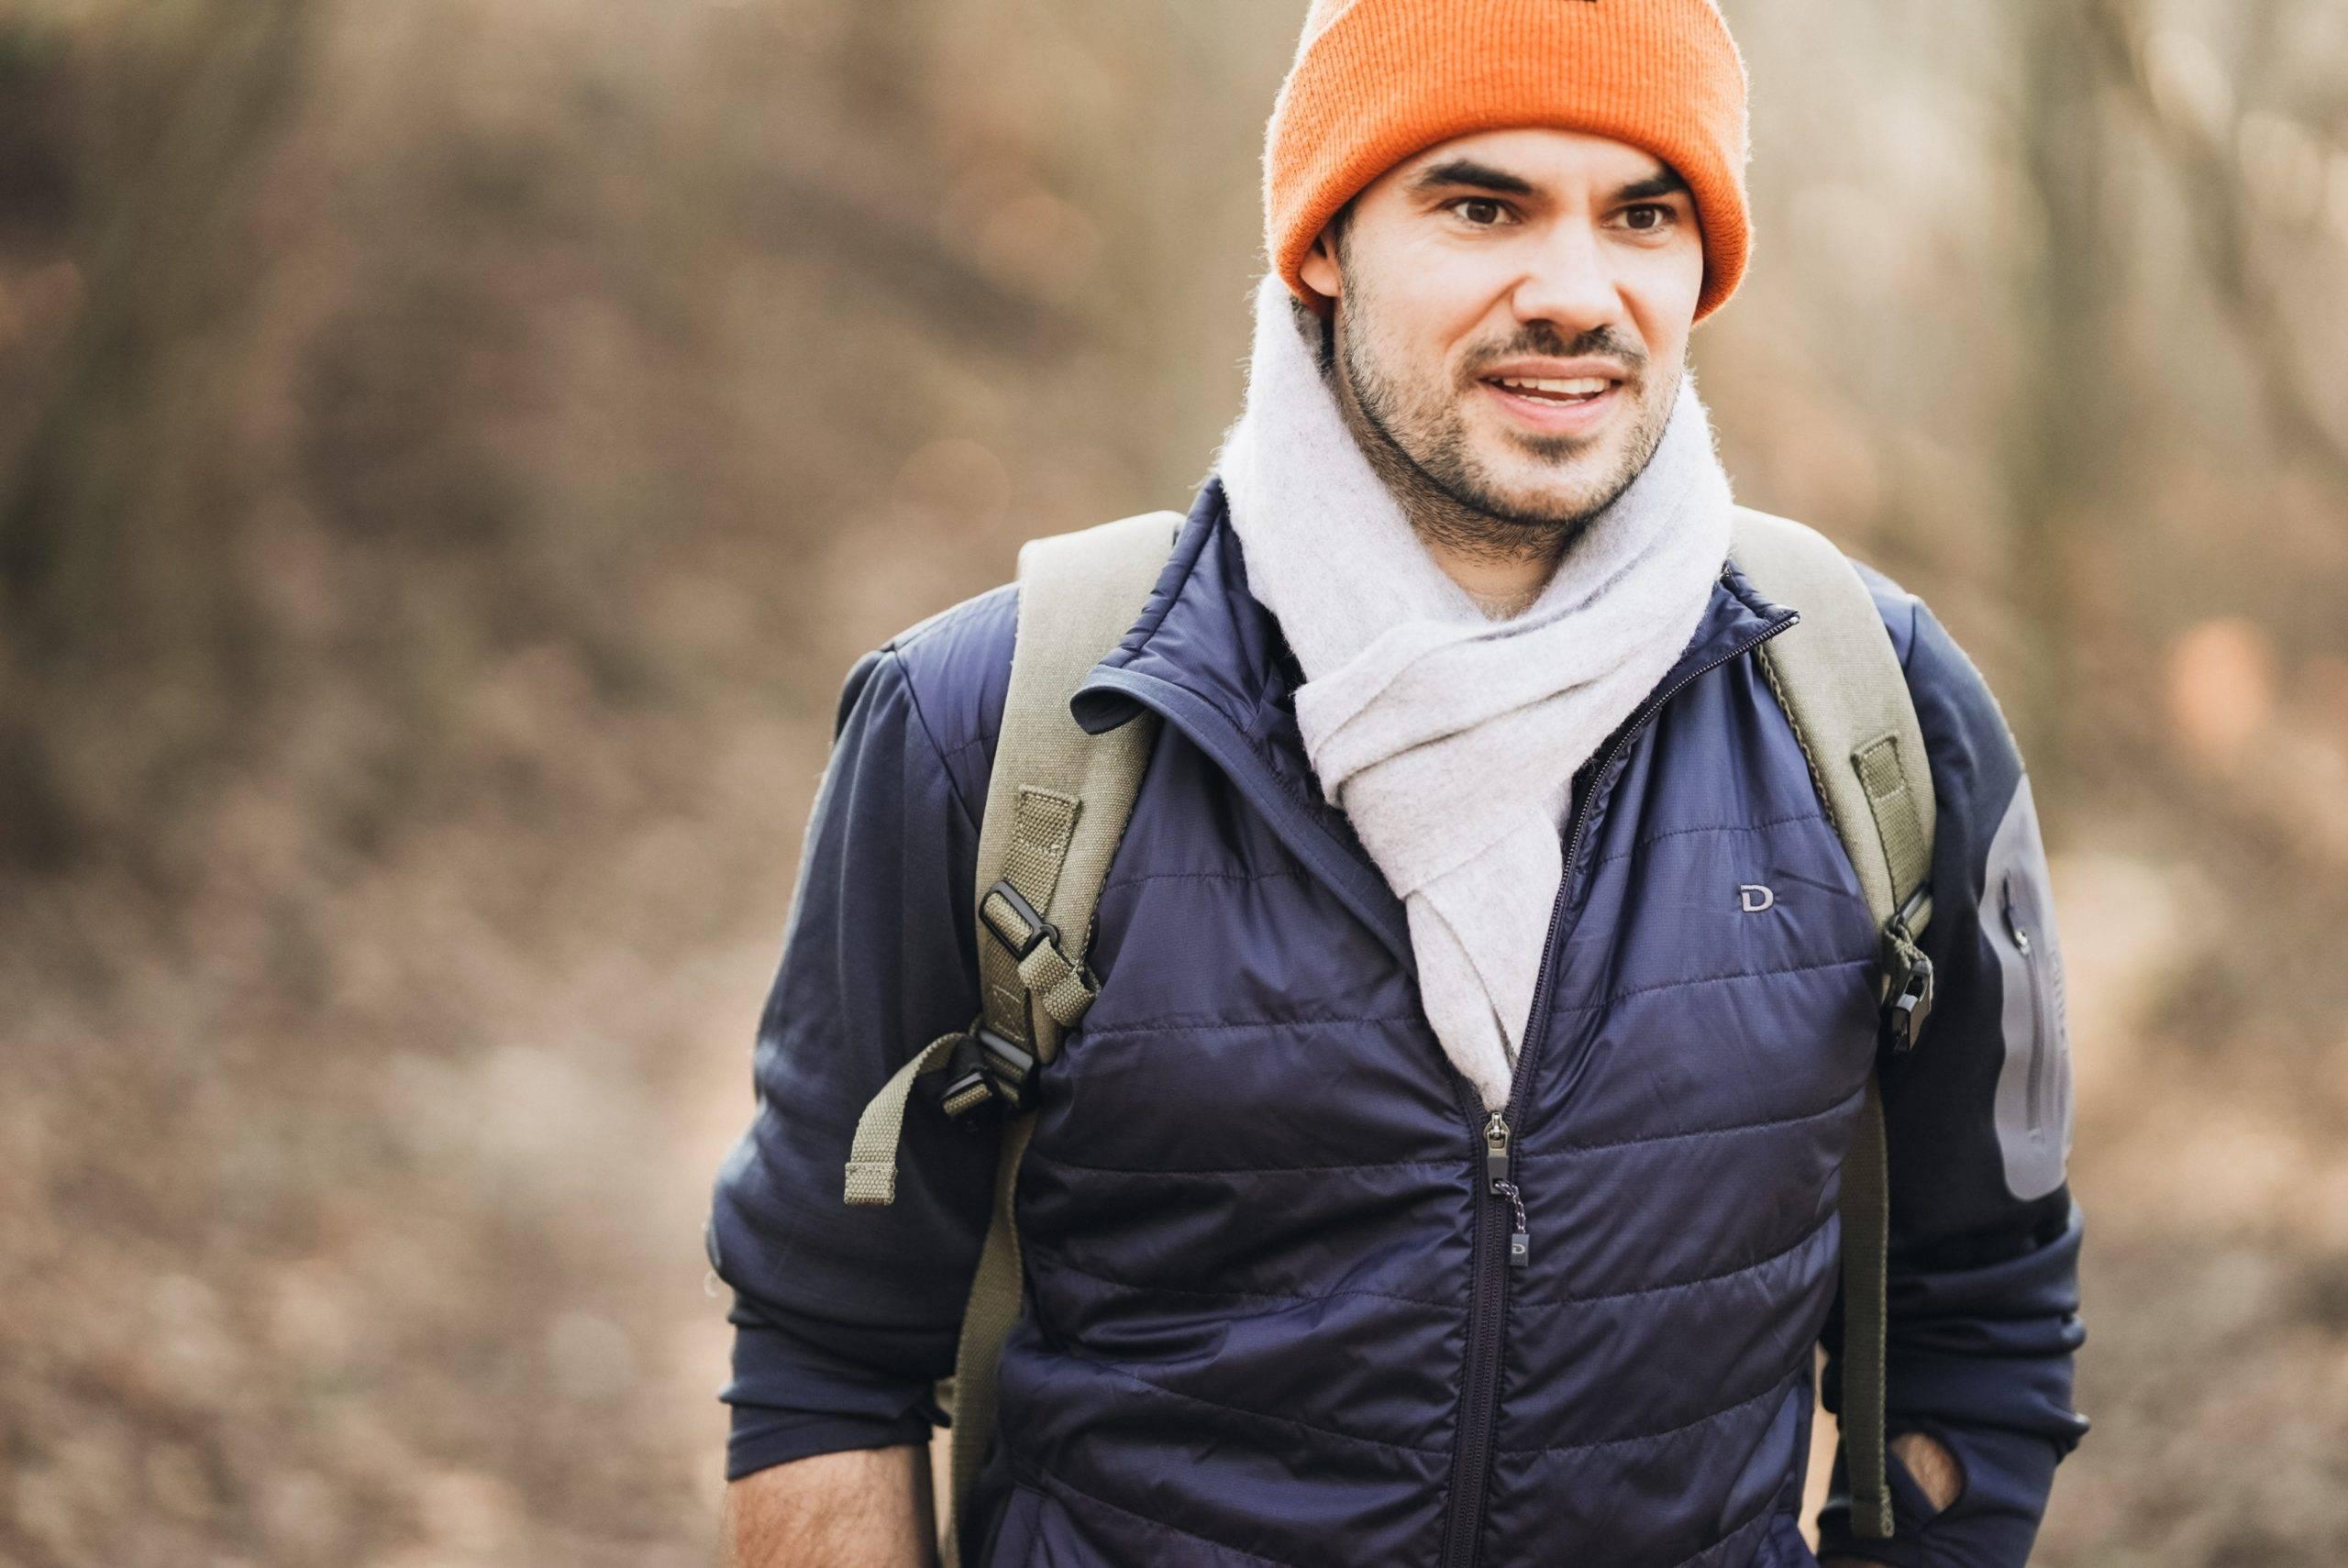 Man with orange toque hiking